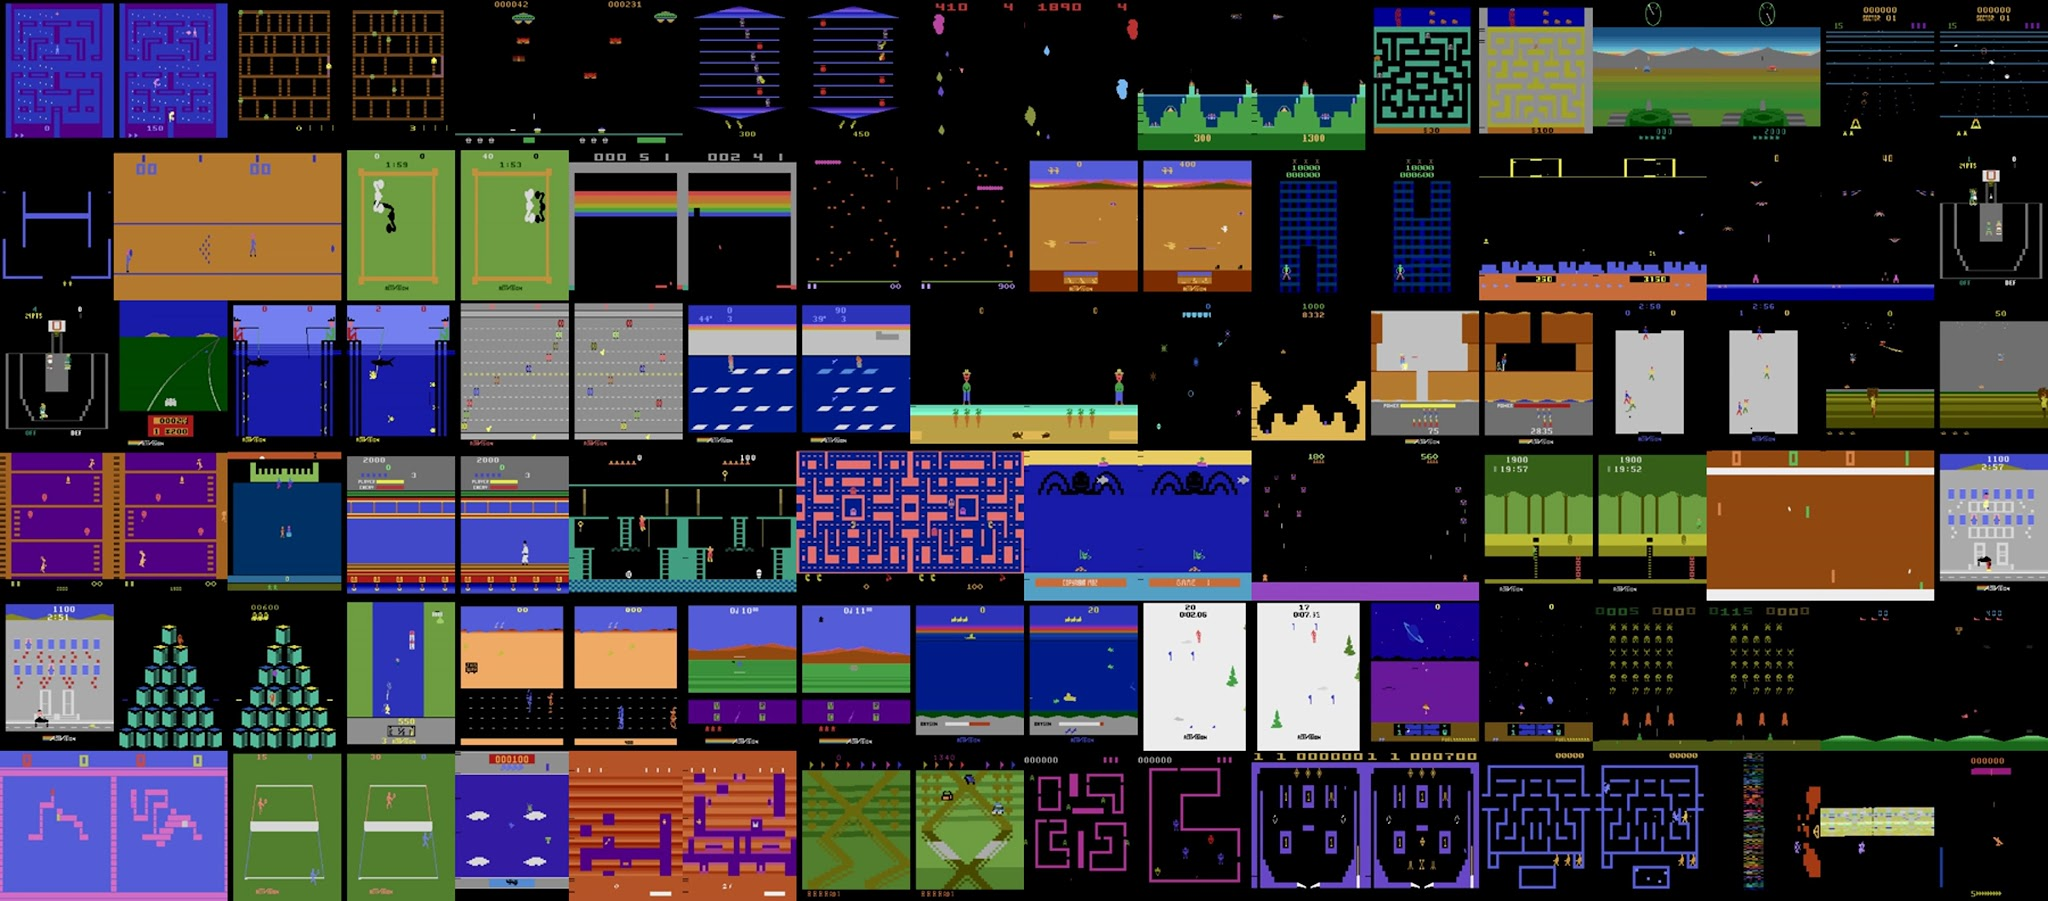 Agent57: Outperforming the human Atari benchmark | DeepMind